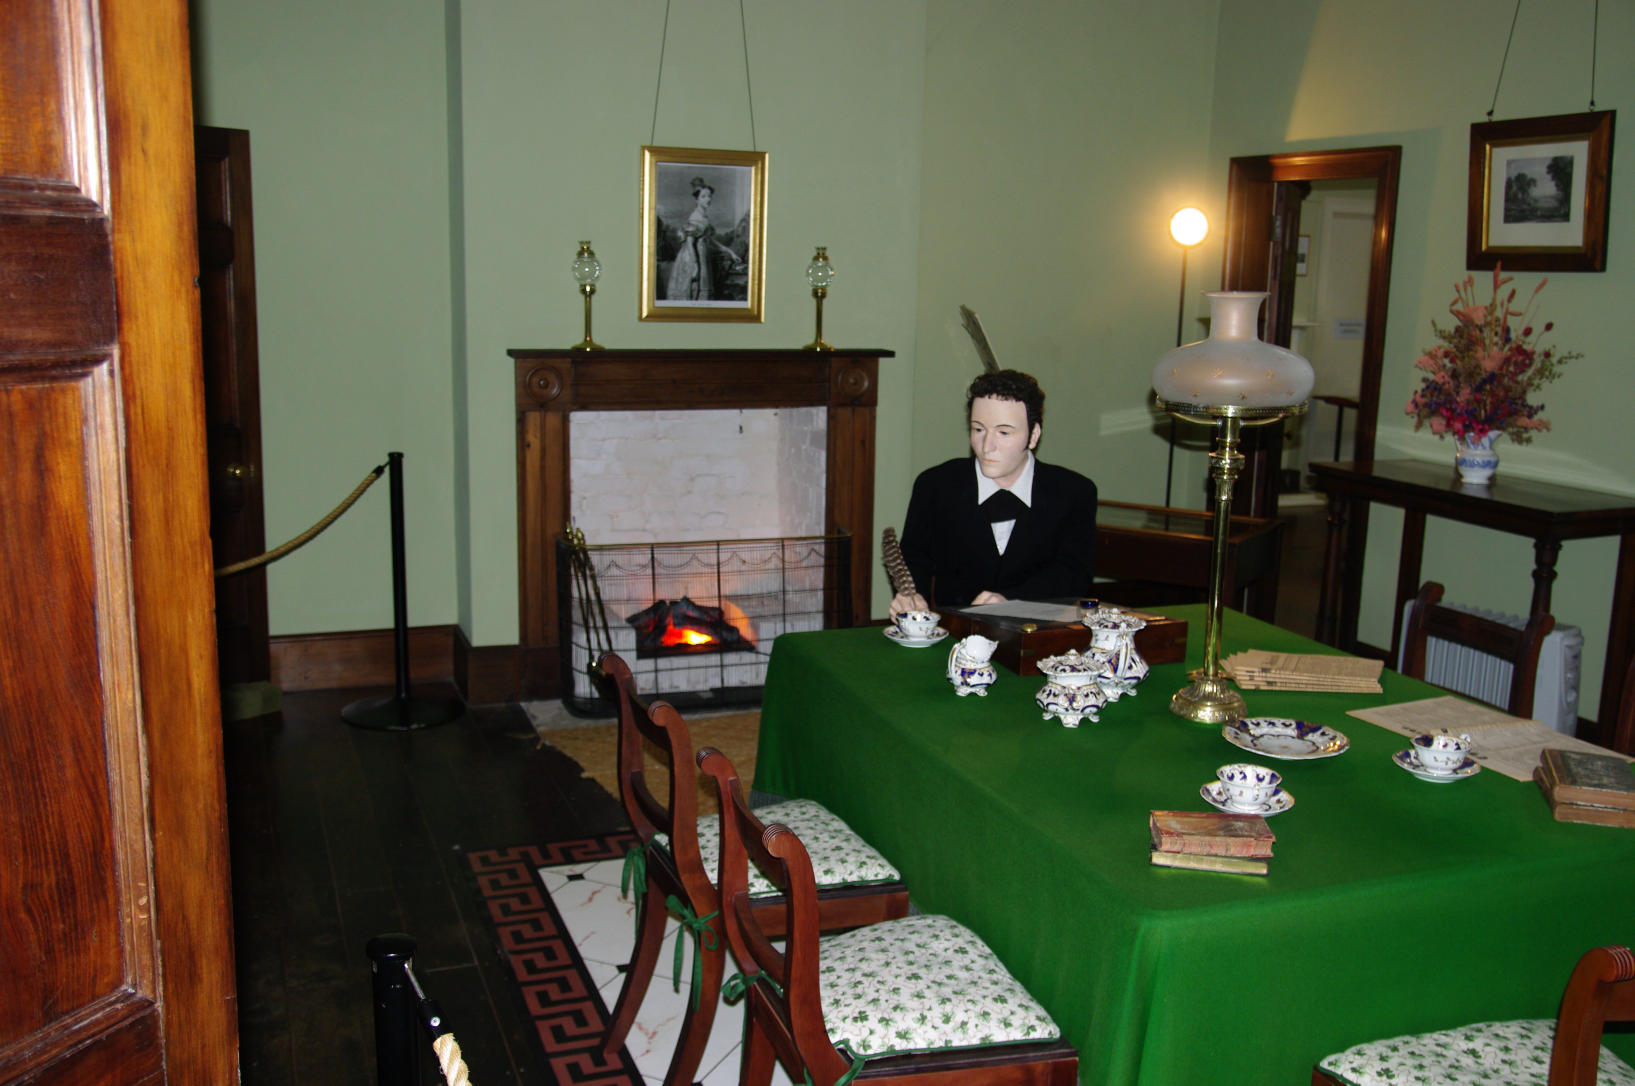 Recreation of the interior of Treaty House in Waitangi, New Zealand. Photo taken on November 10, 2009.